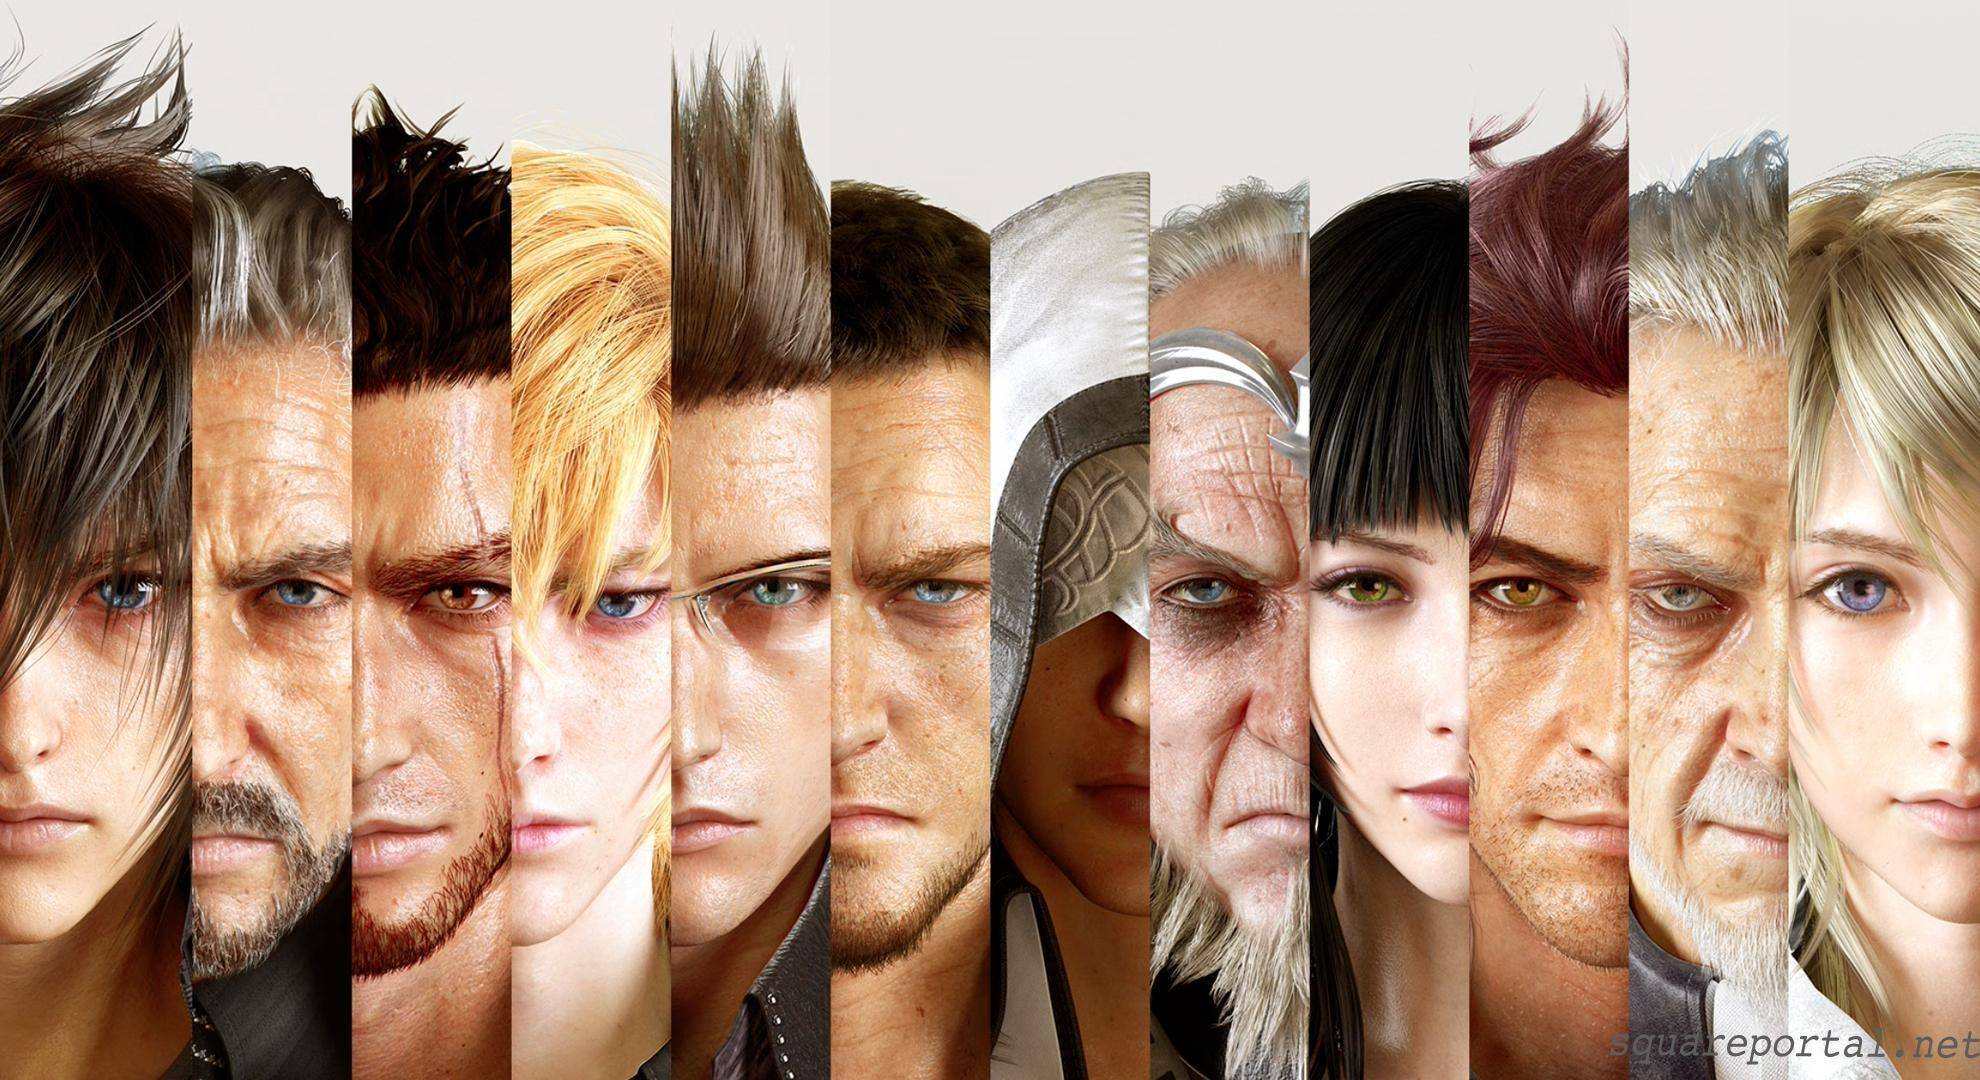 Final Fantasy Wallpapers 1080p - Wallpaper Cave